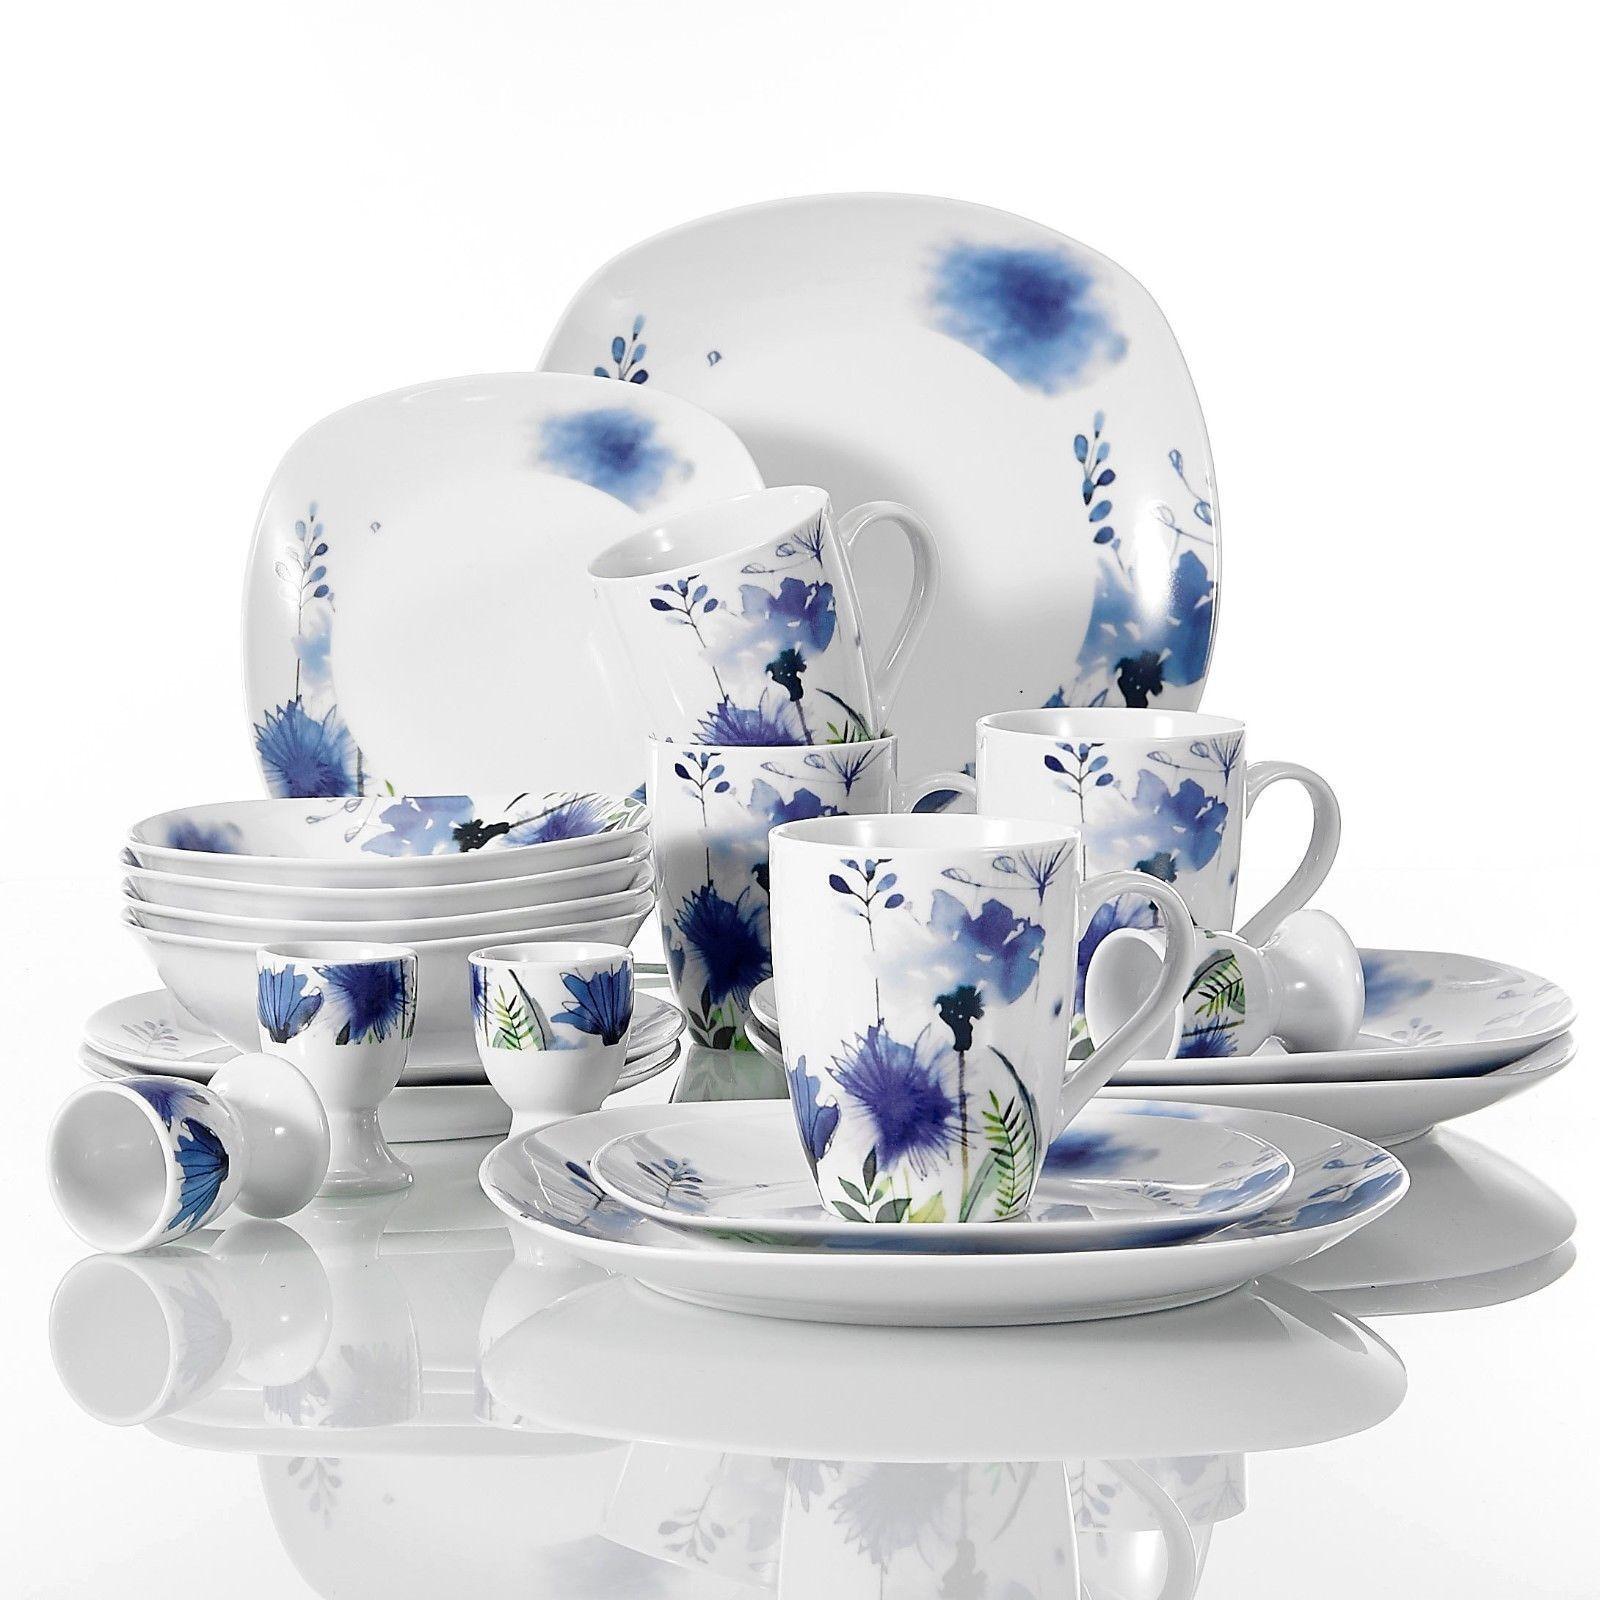 Set da cena 20Pc in ceramica stoviglie stoviglie stoviglie Sala da Pranzo Festa Floreale Blu